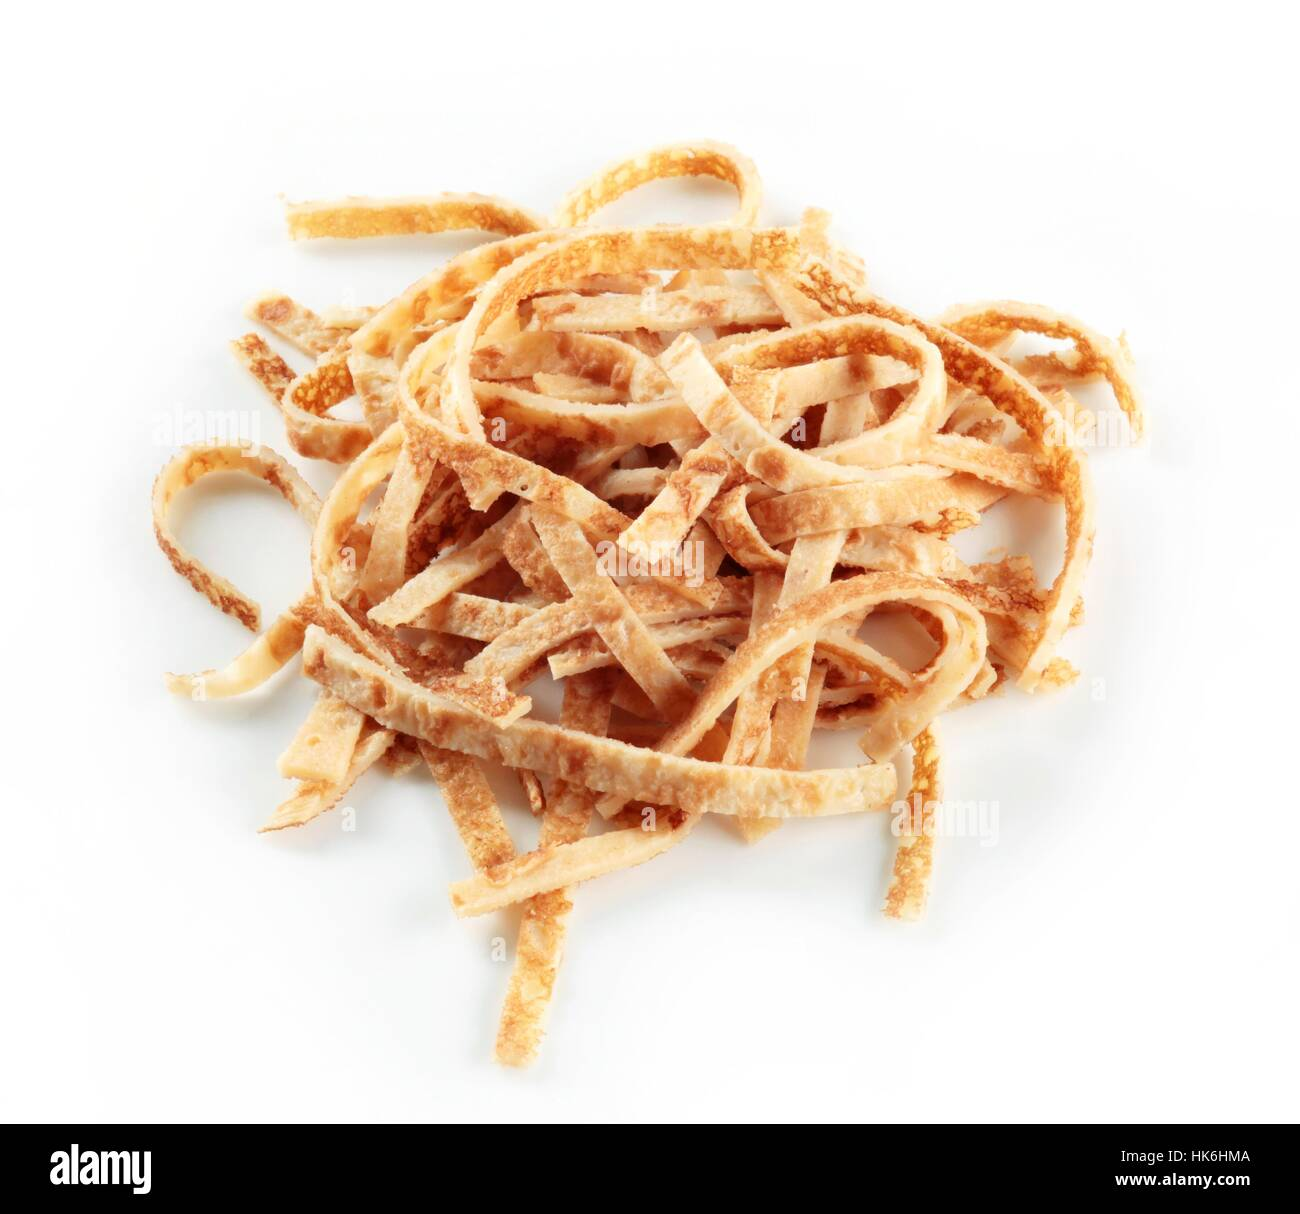 food, aliment, closeup, studio, noodles, dried, heap, sliced, pancake, slices, - Stock Image